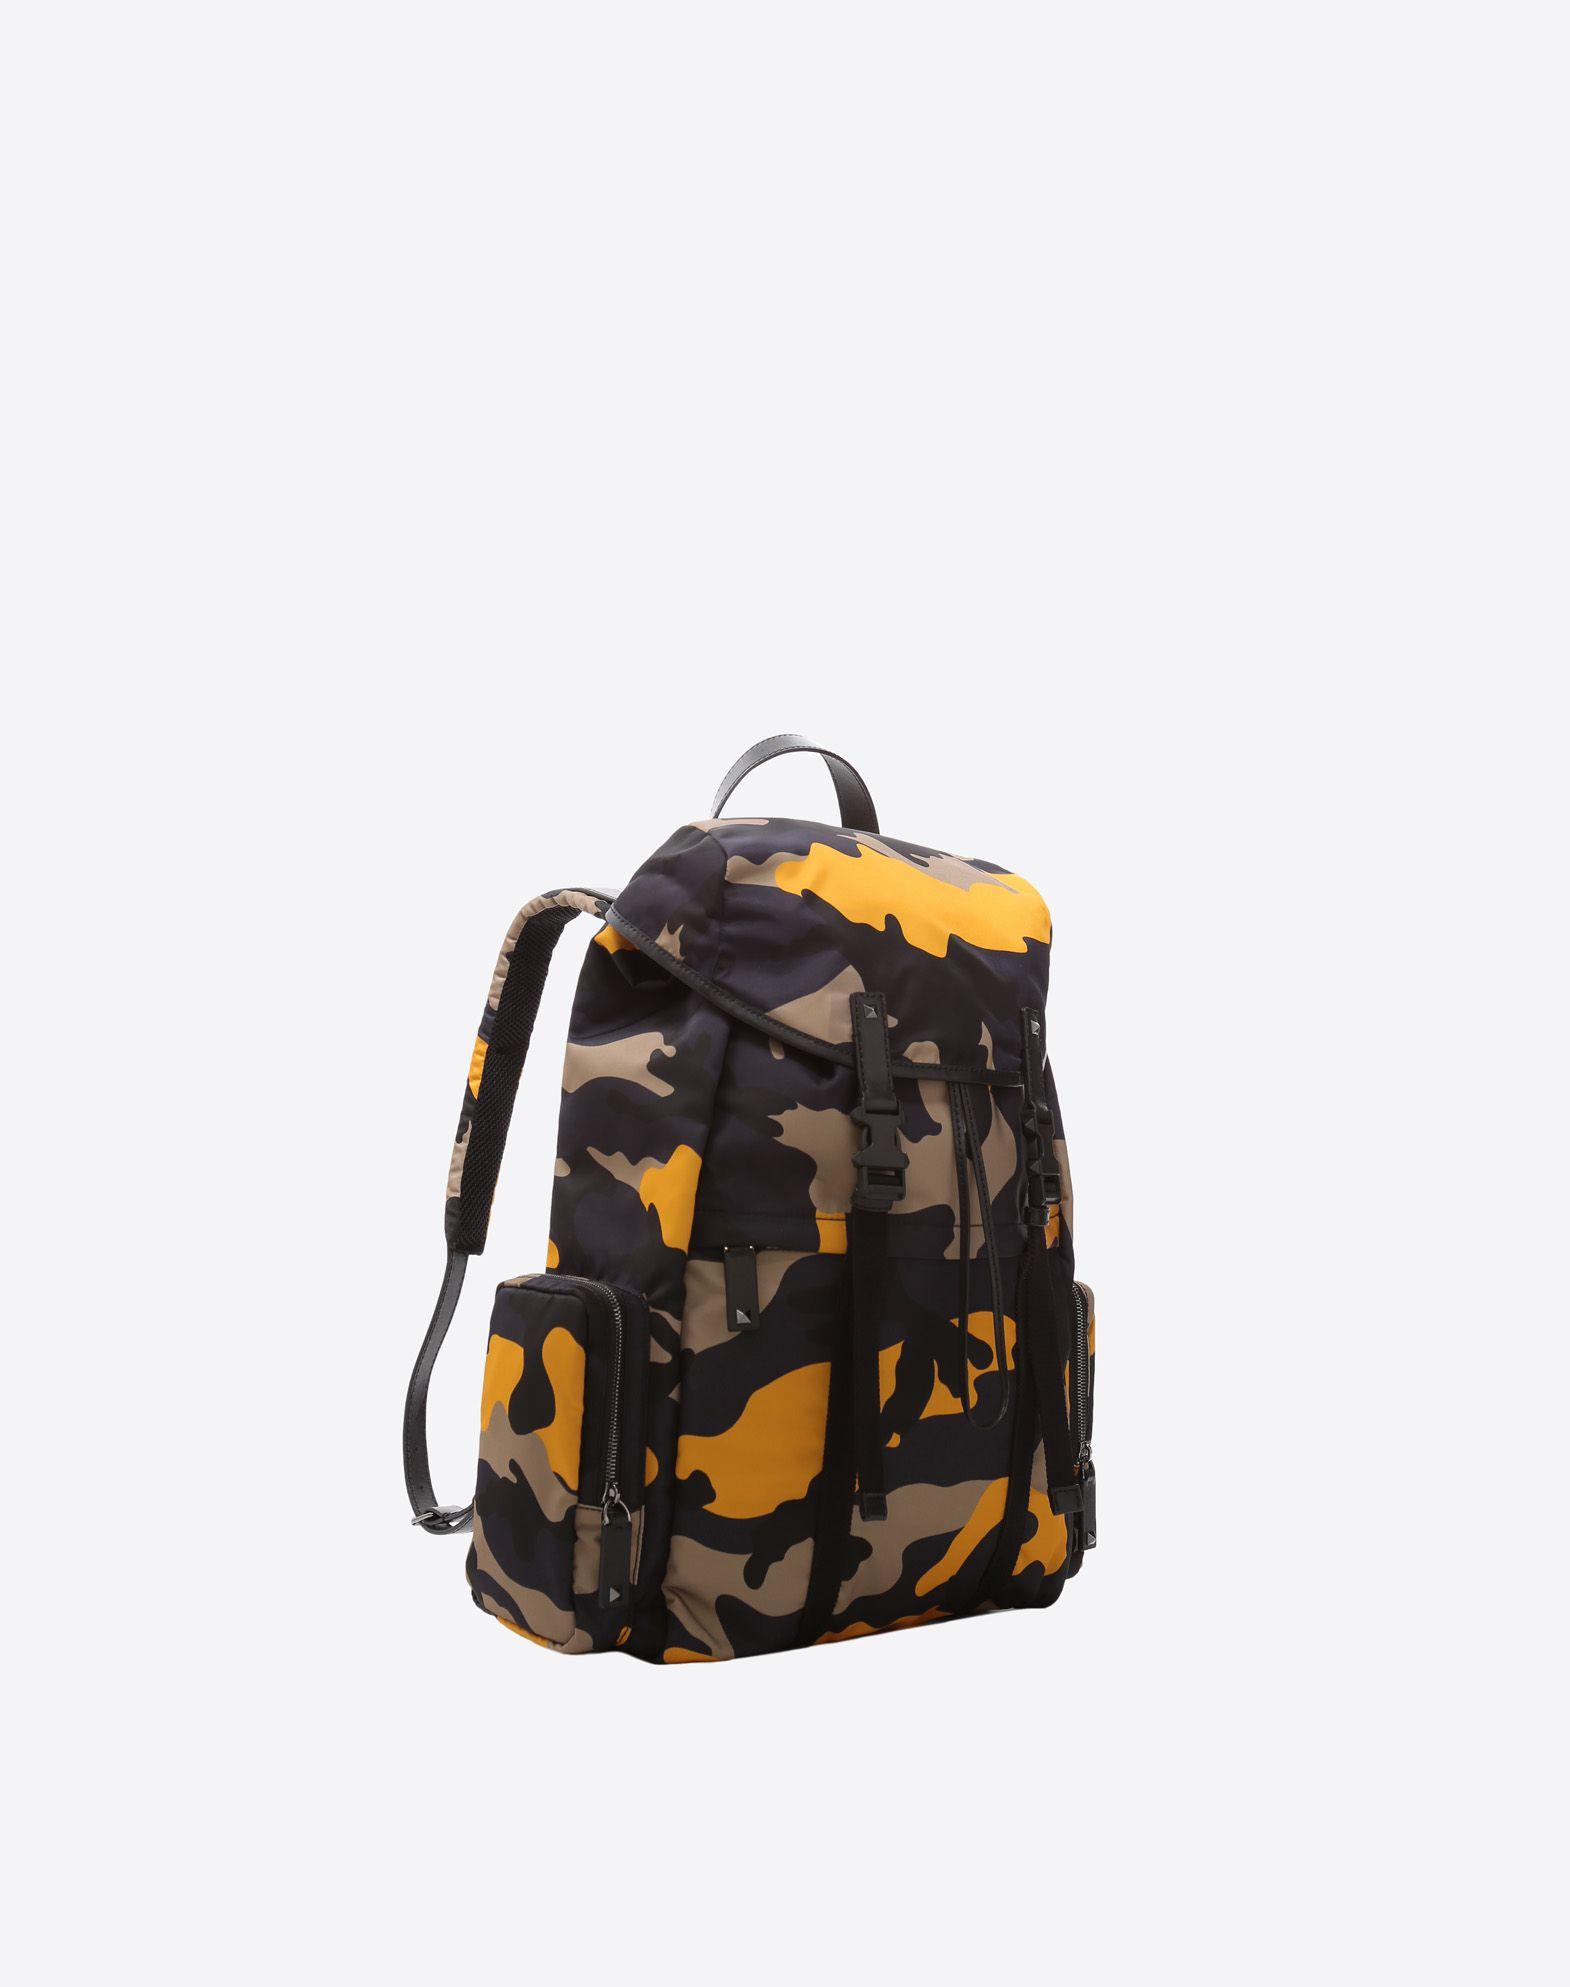 VALENTINO GARAVANI UOMO Camouflage Large Backpack Backpack U r